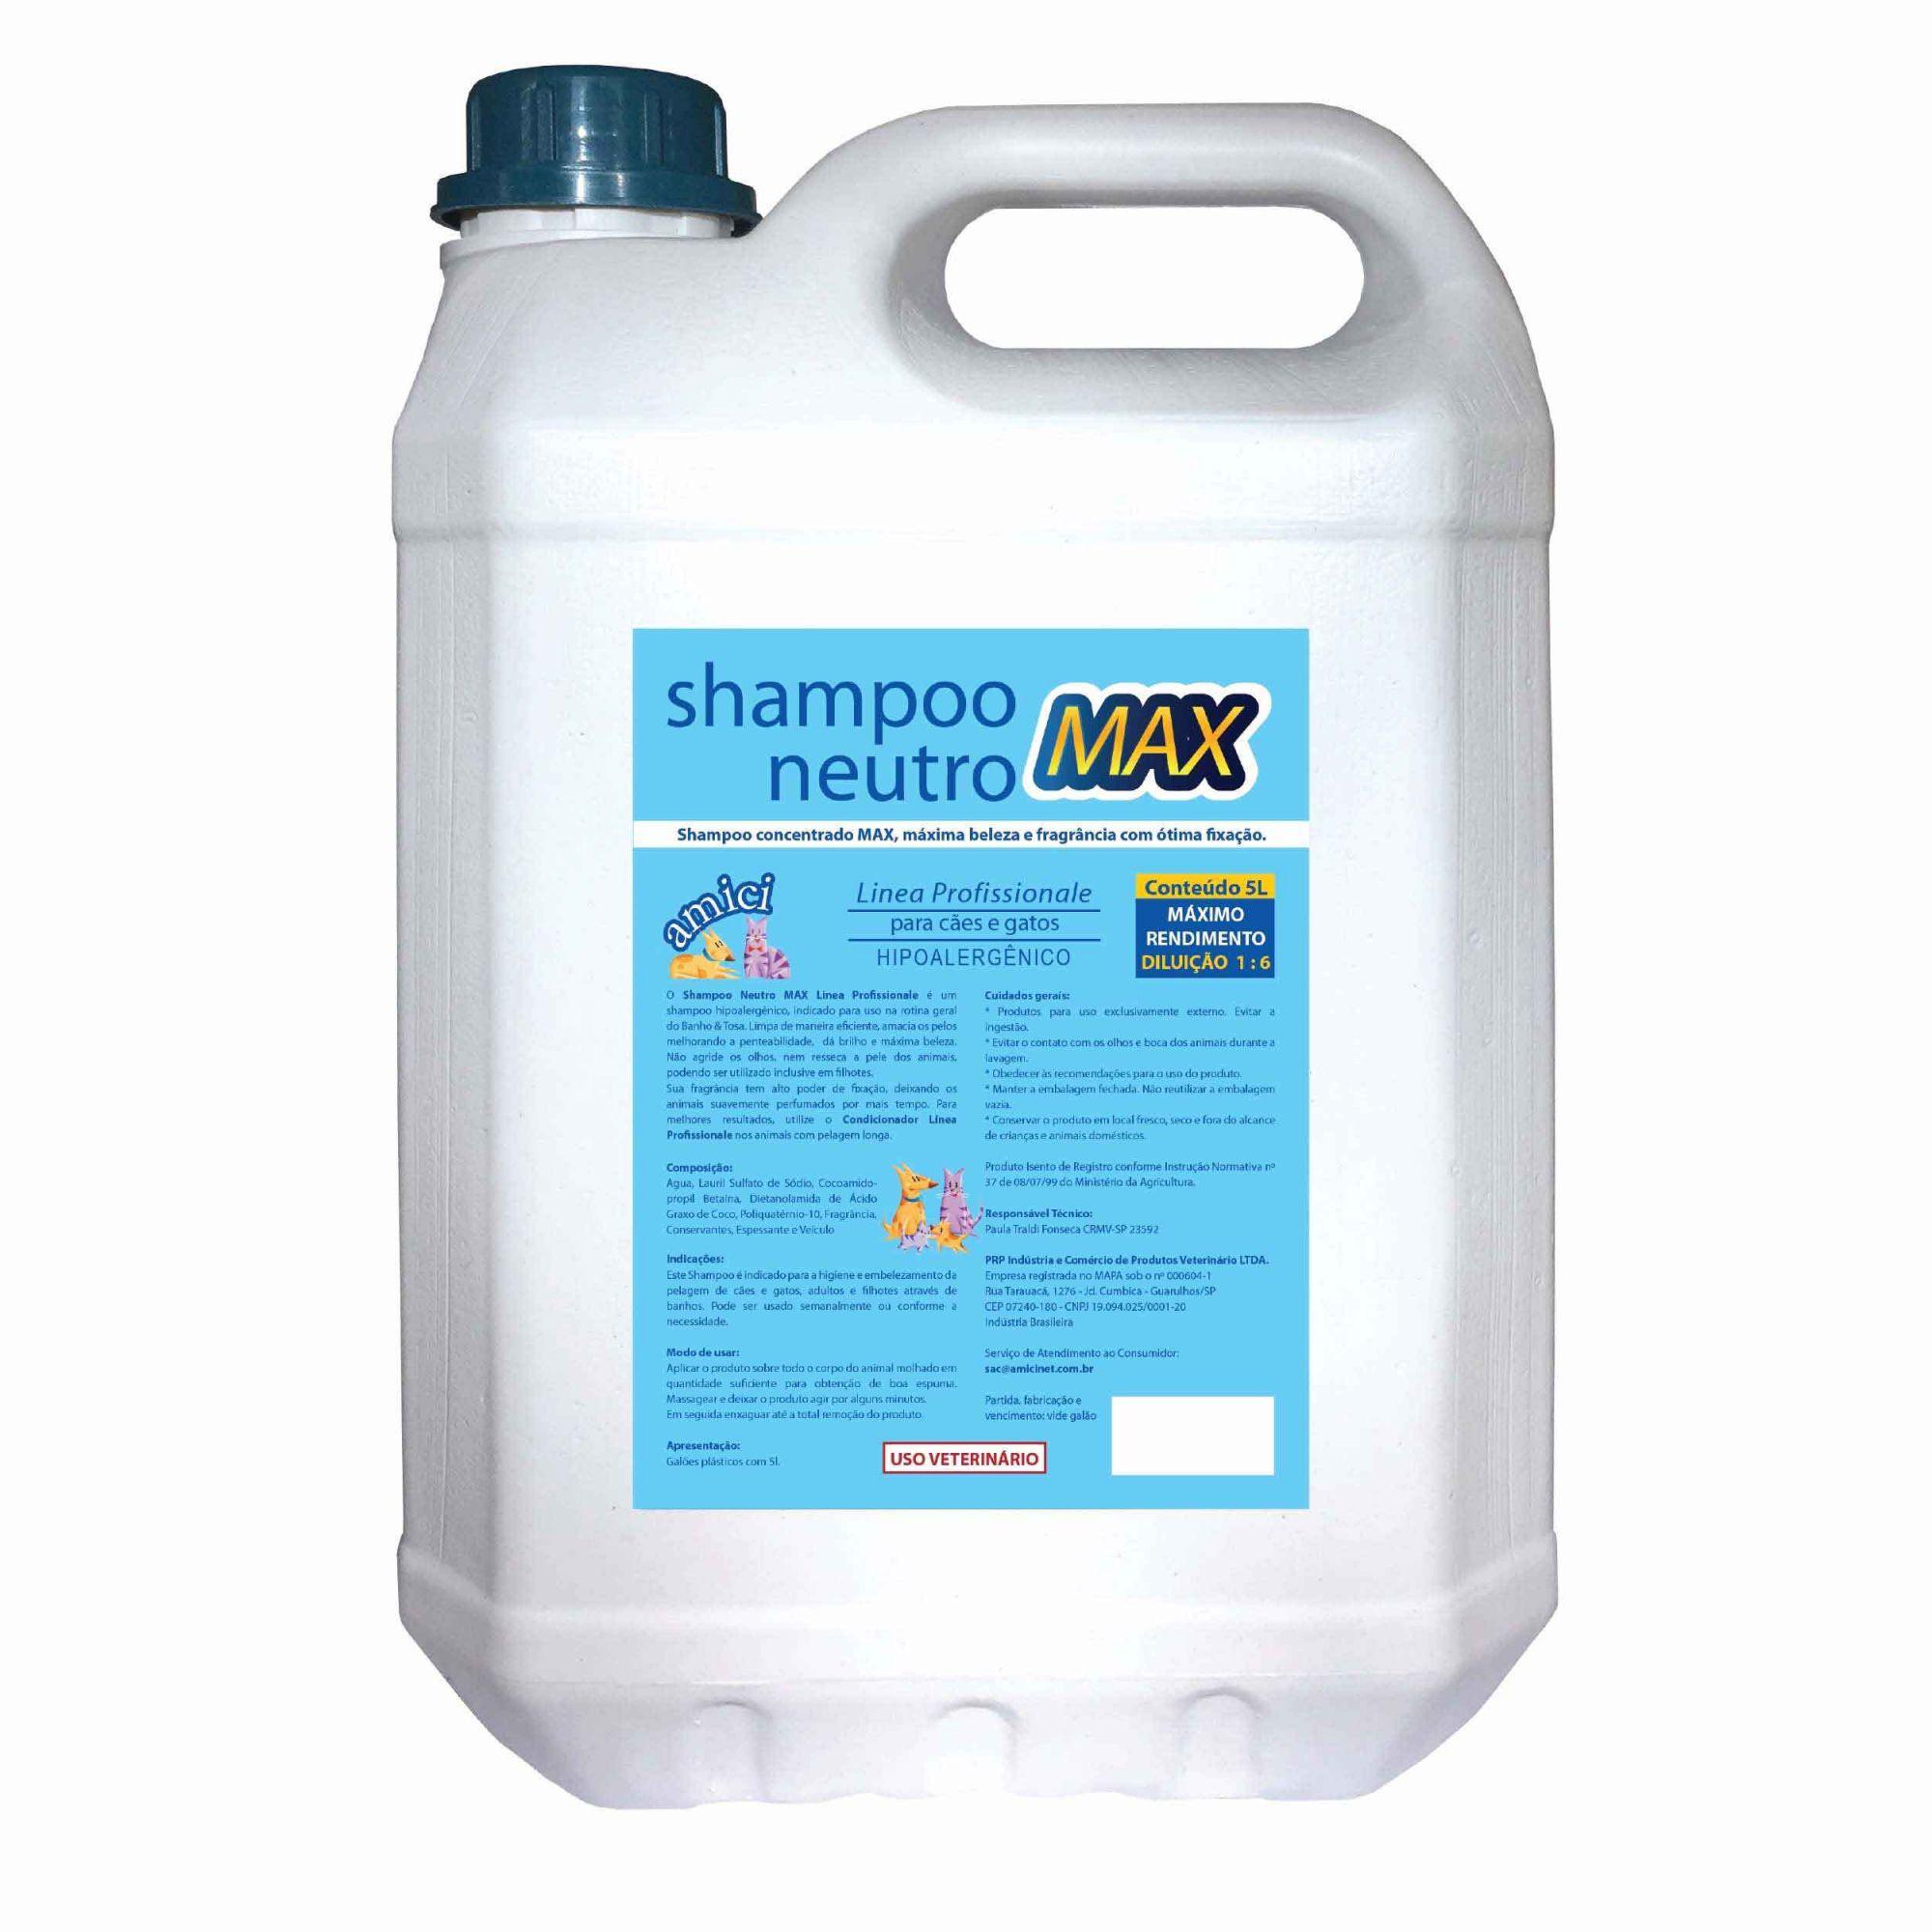 Shampoo Neutro MAX Linea Profissionale